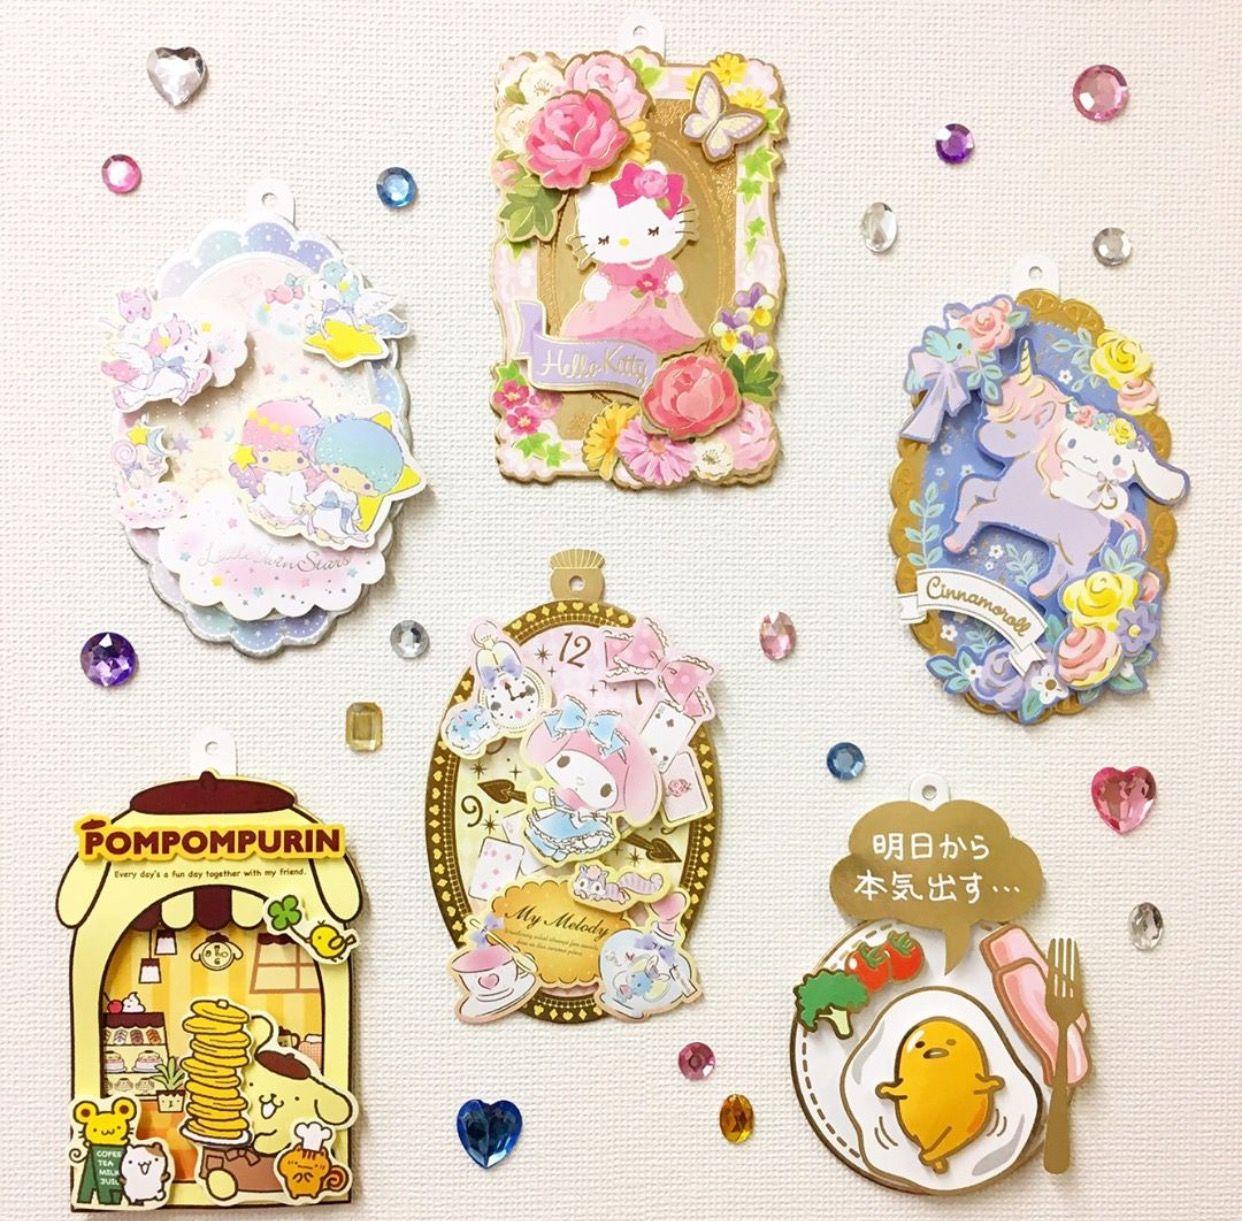 Sanrio Greetings Cards Sanrio 3 Pinterest Sanrio And